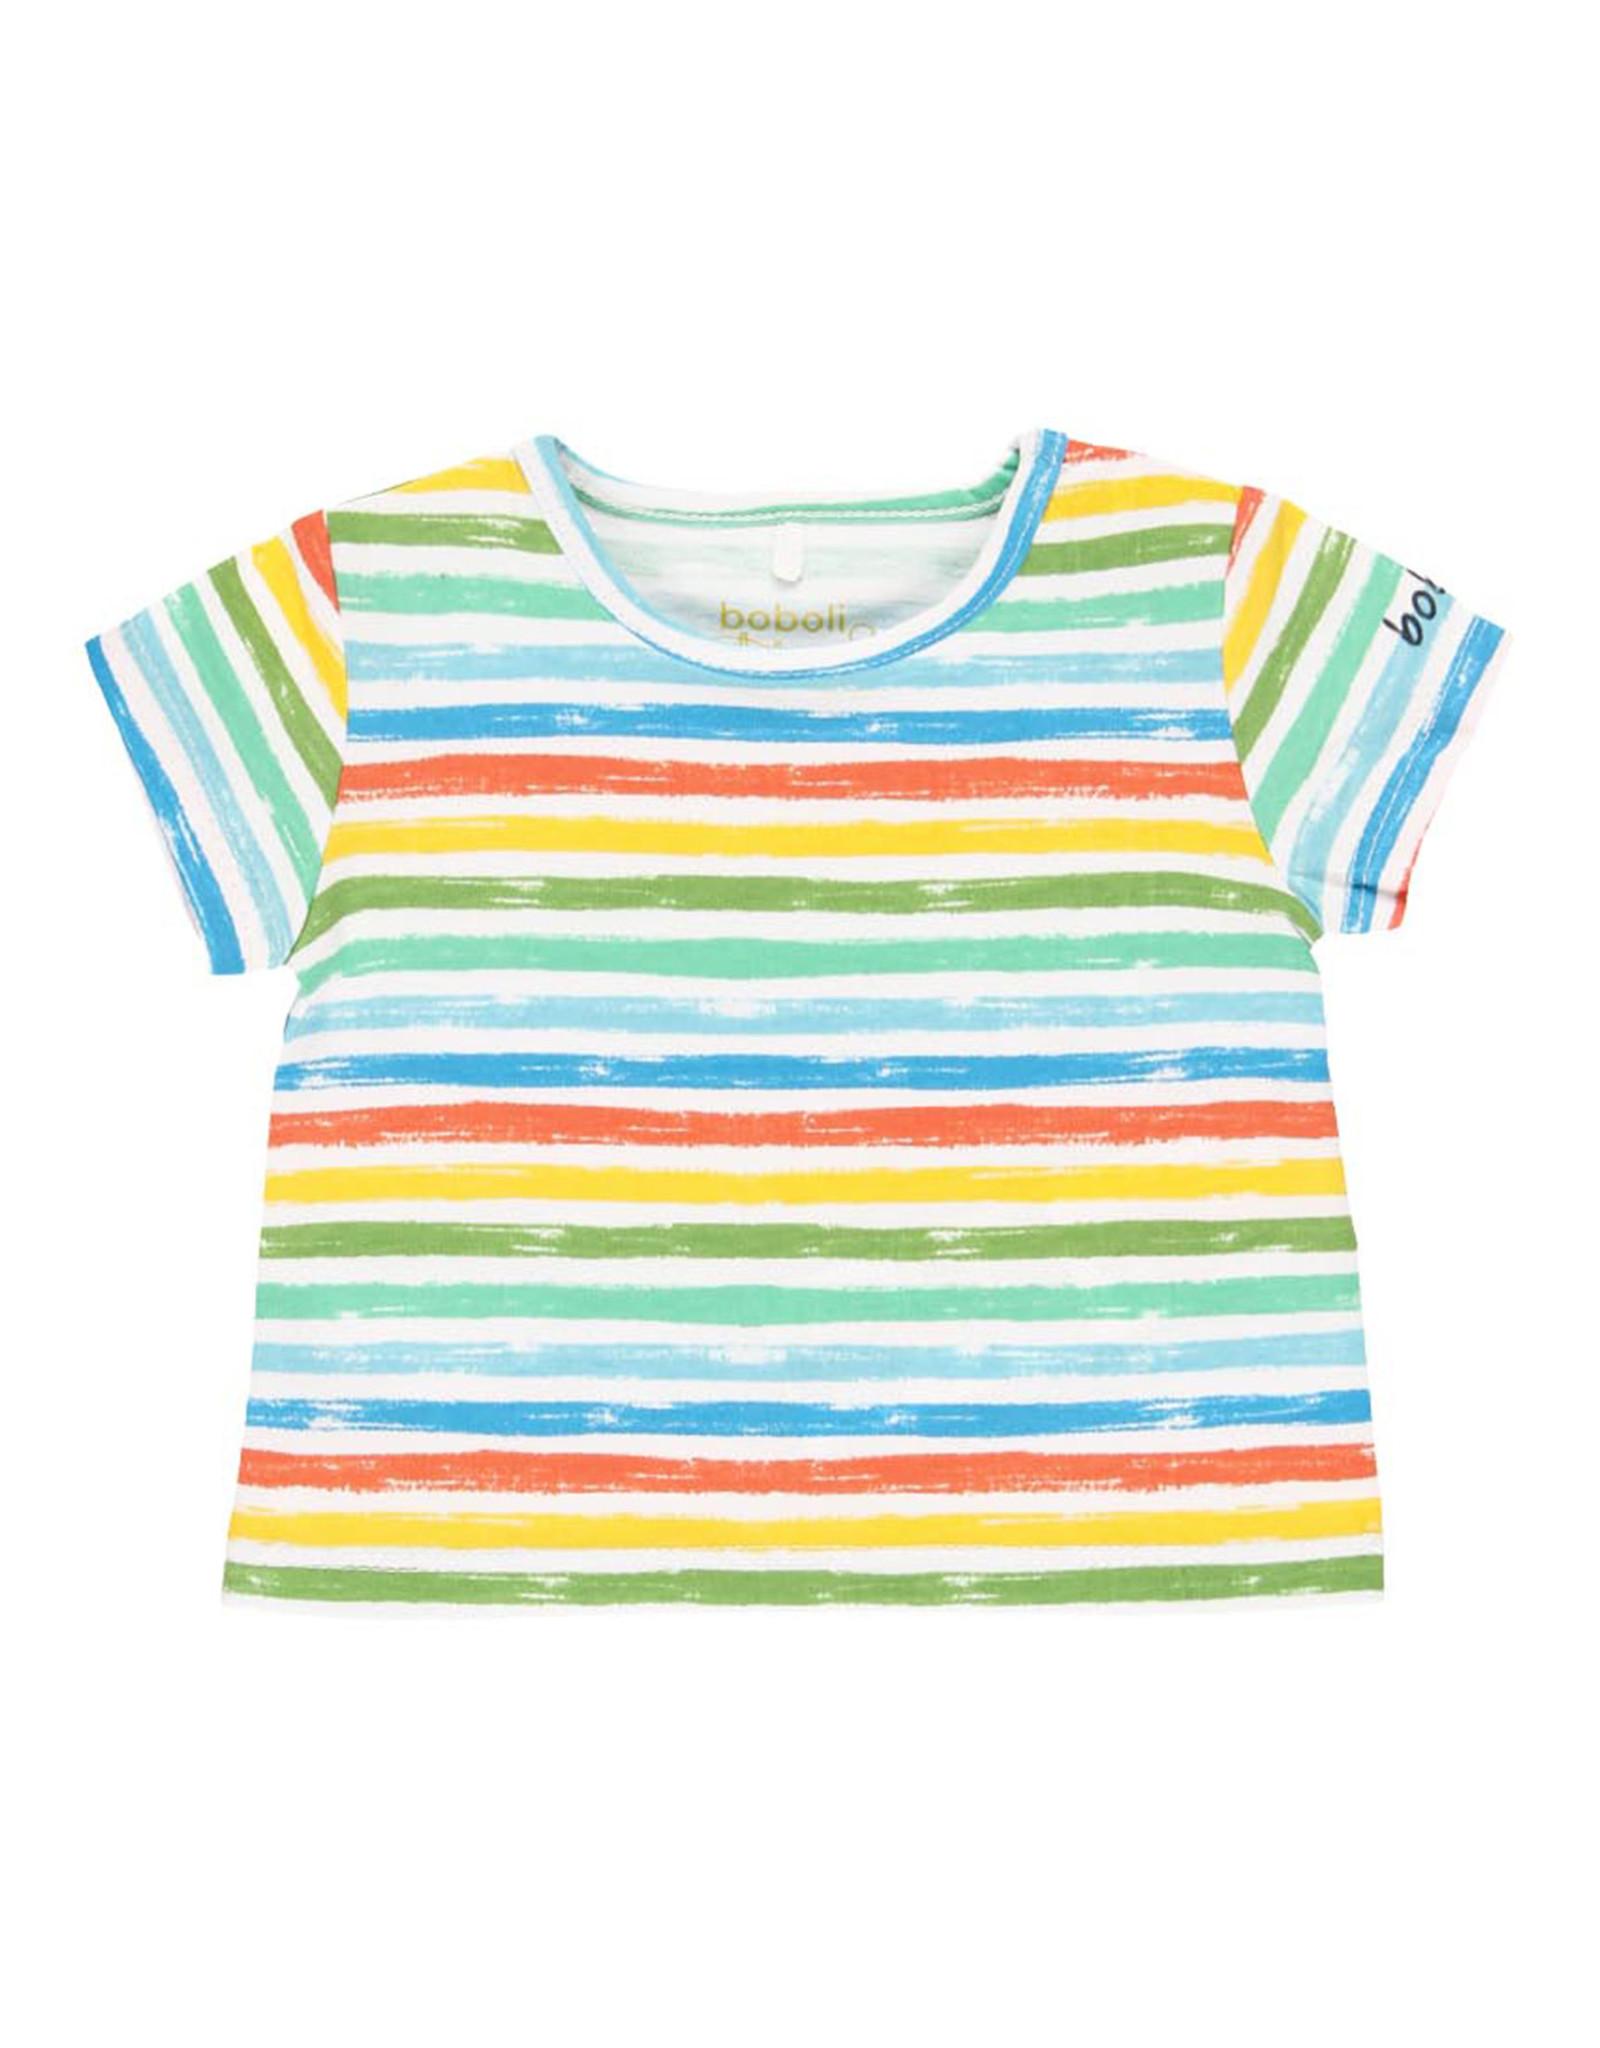 Boboli Tee Shirt